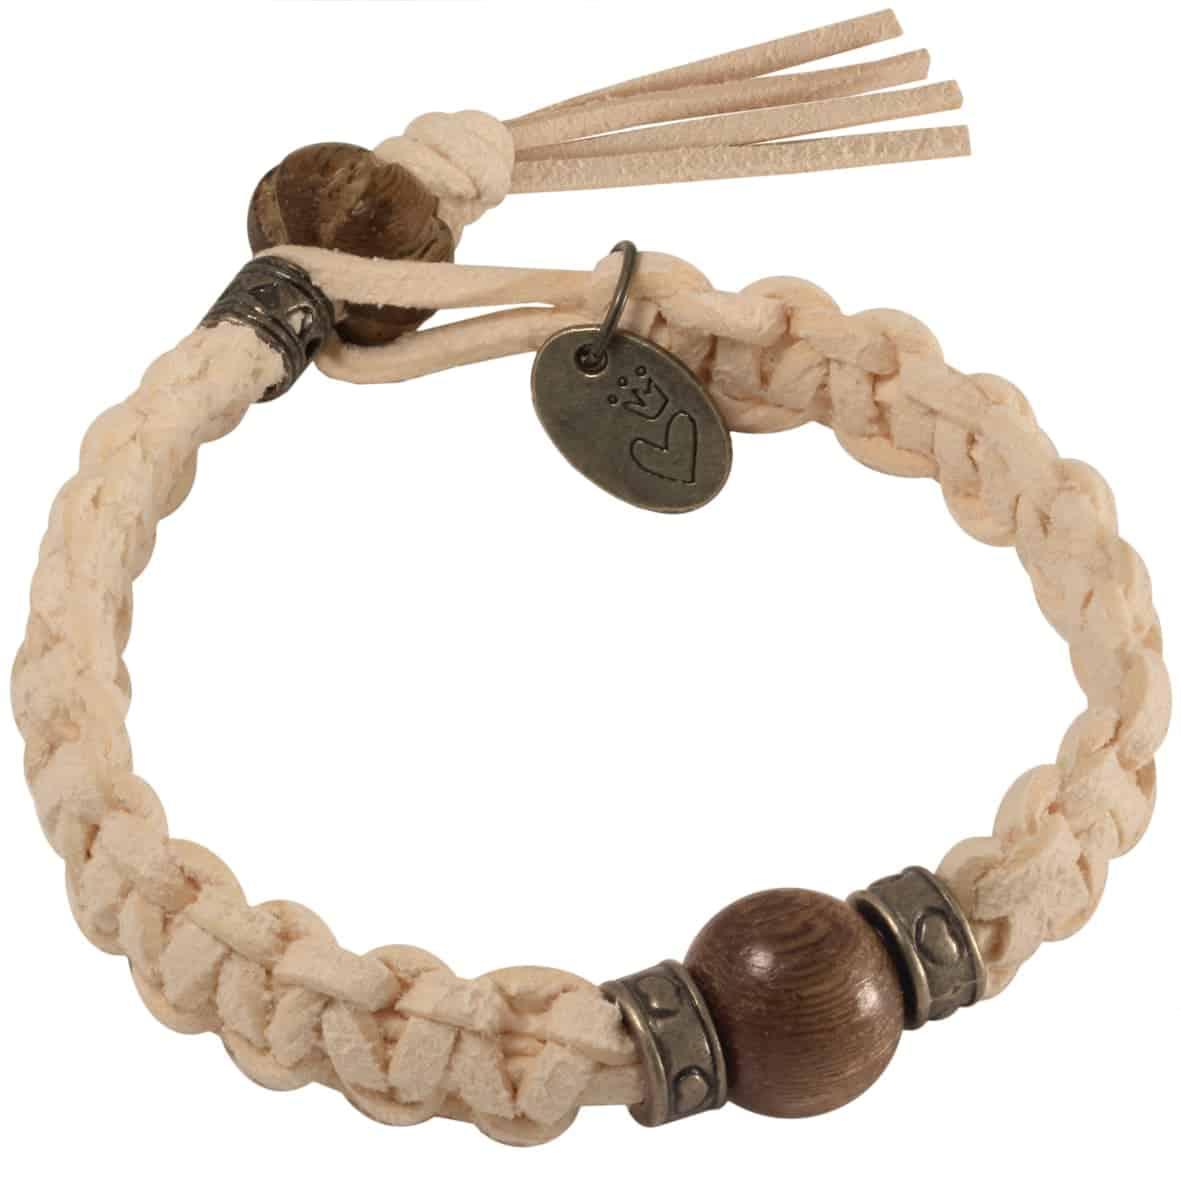 Geknüpftes Makramee Armband von kronjuwelen.com